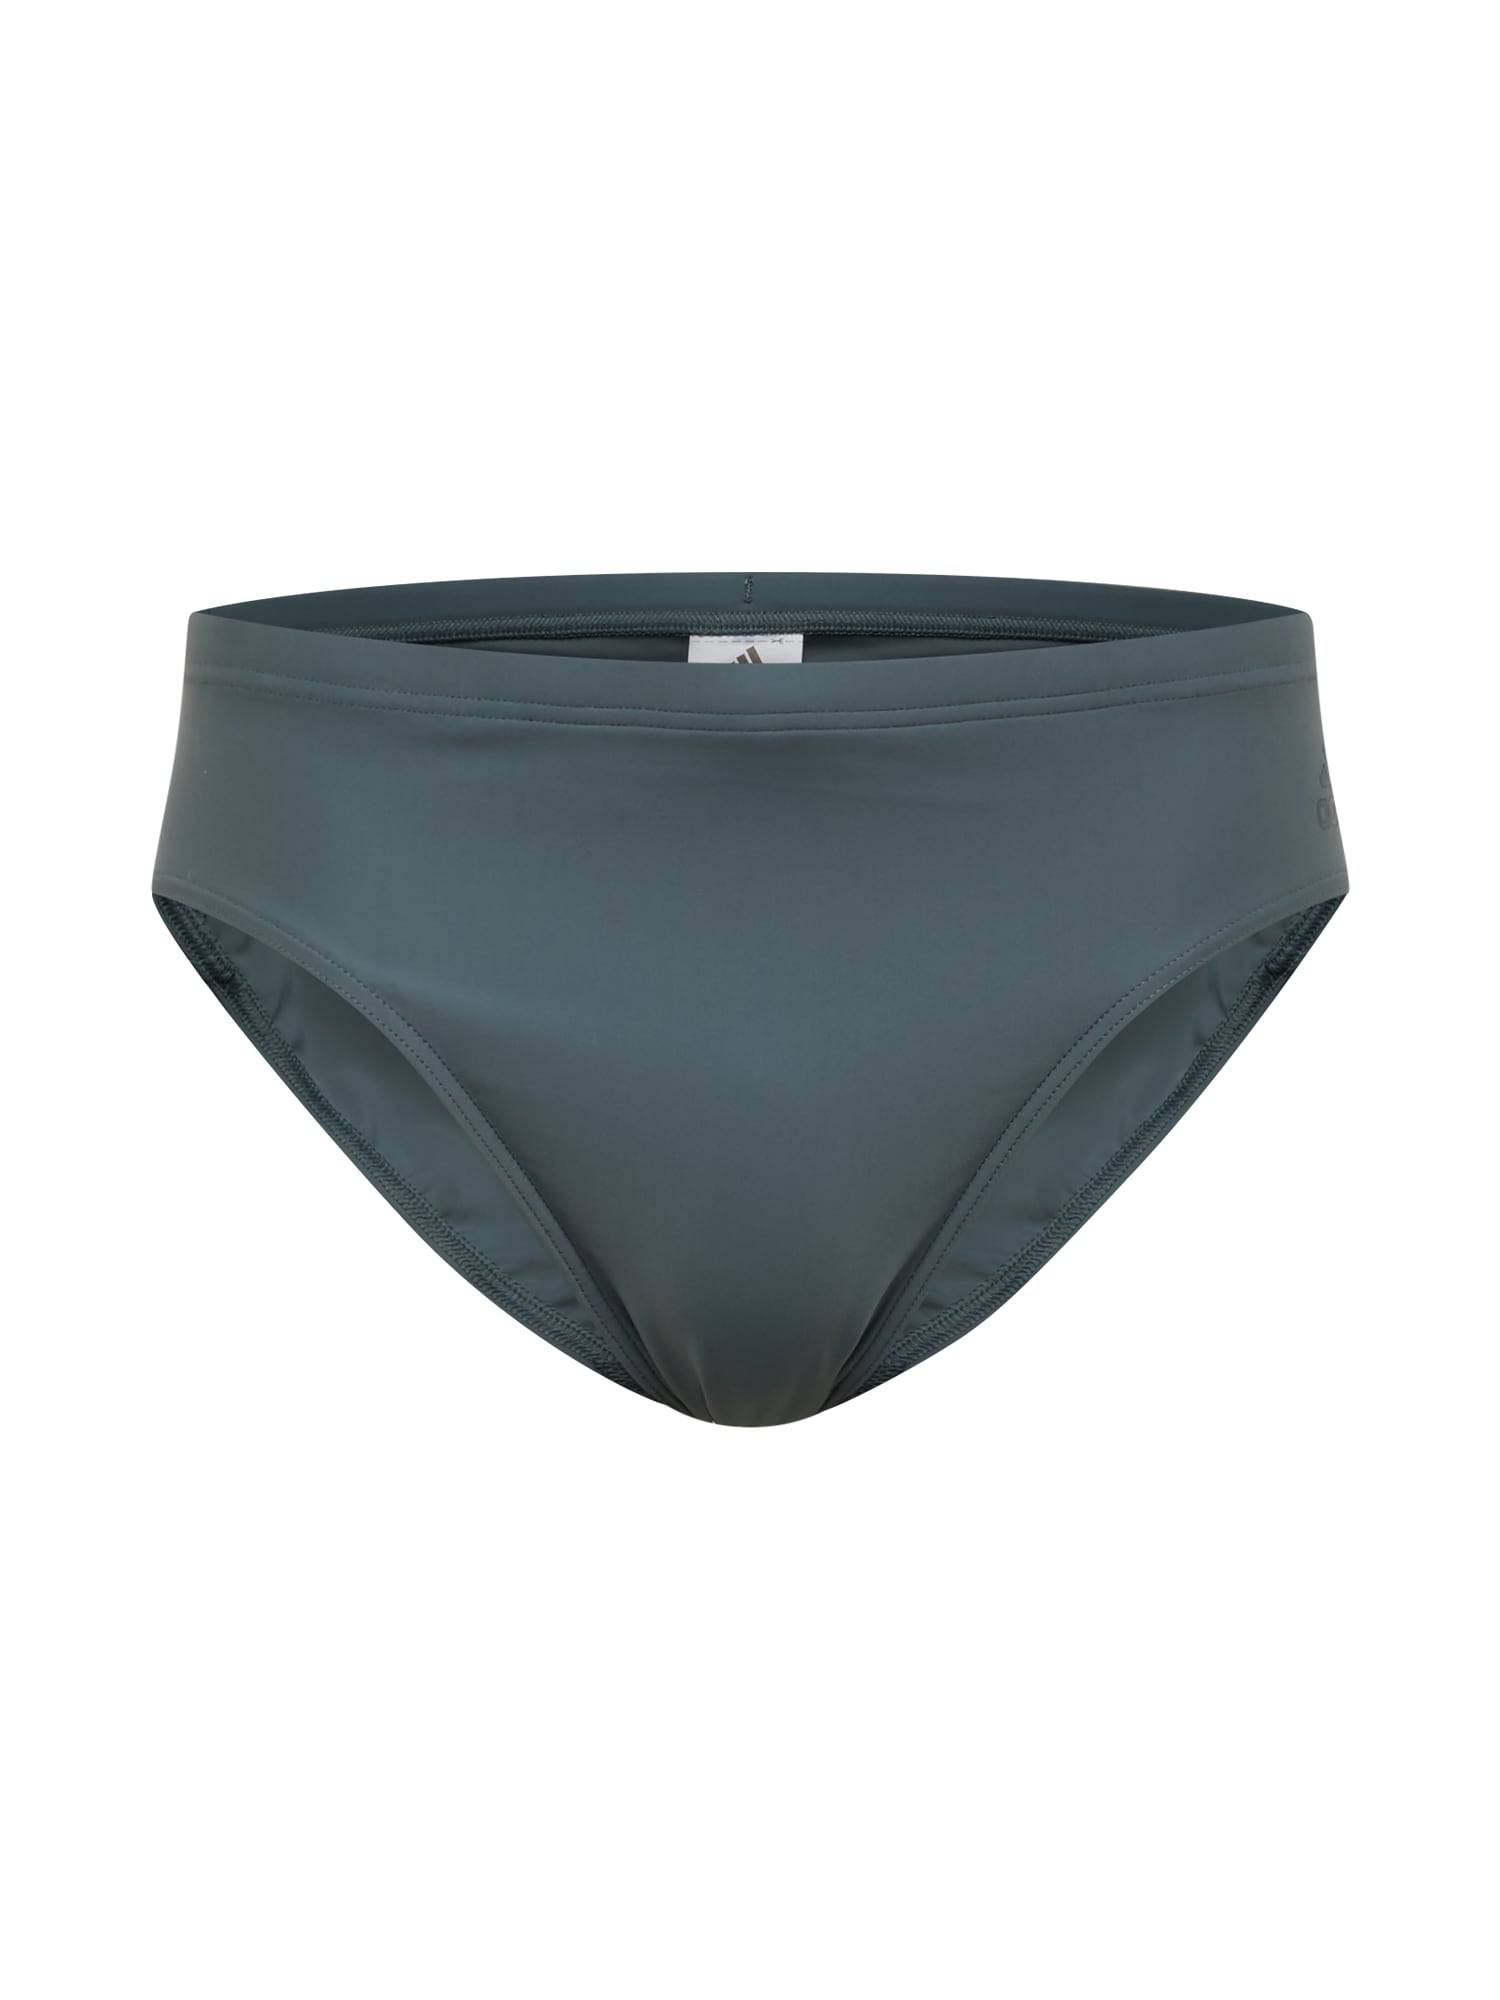 ADIDAS PERFORMANCE Maillot de bain de sport  - Bleu - Taille: 8 - male